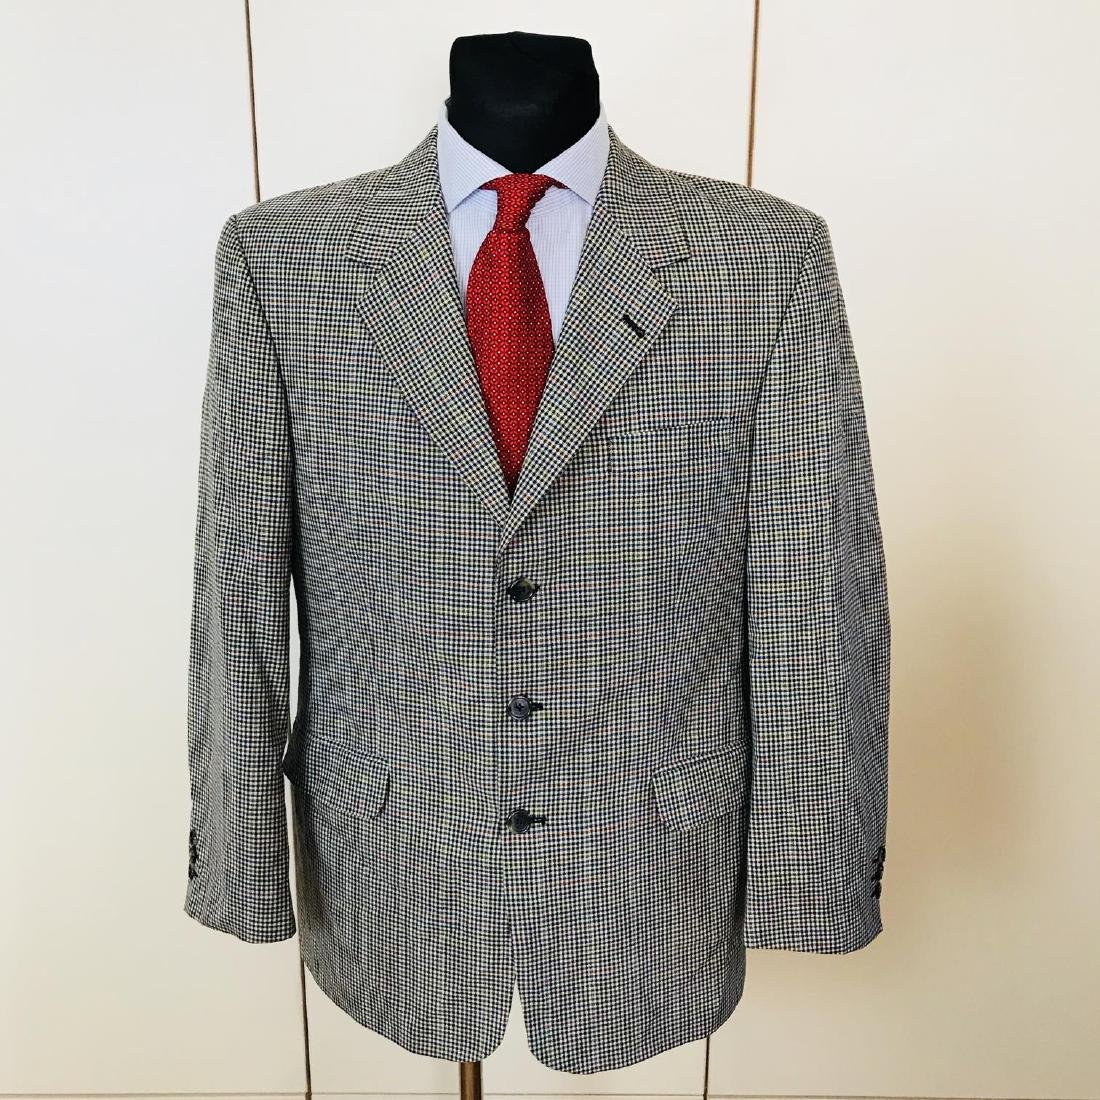 Vintage Men's Paolo Negrato Jacket Blazer Size US 40